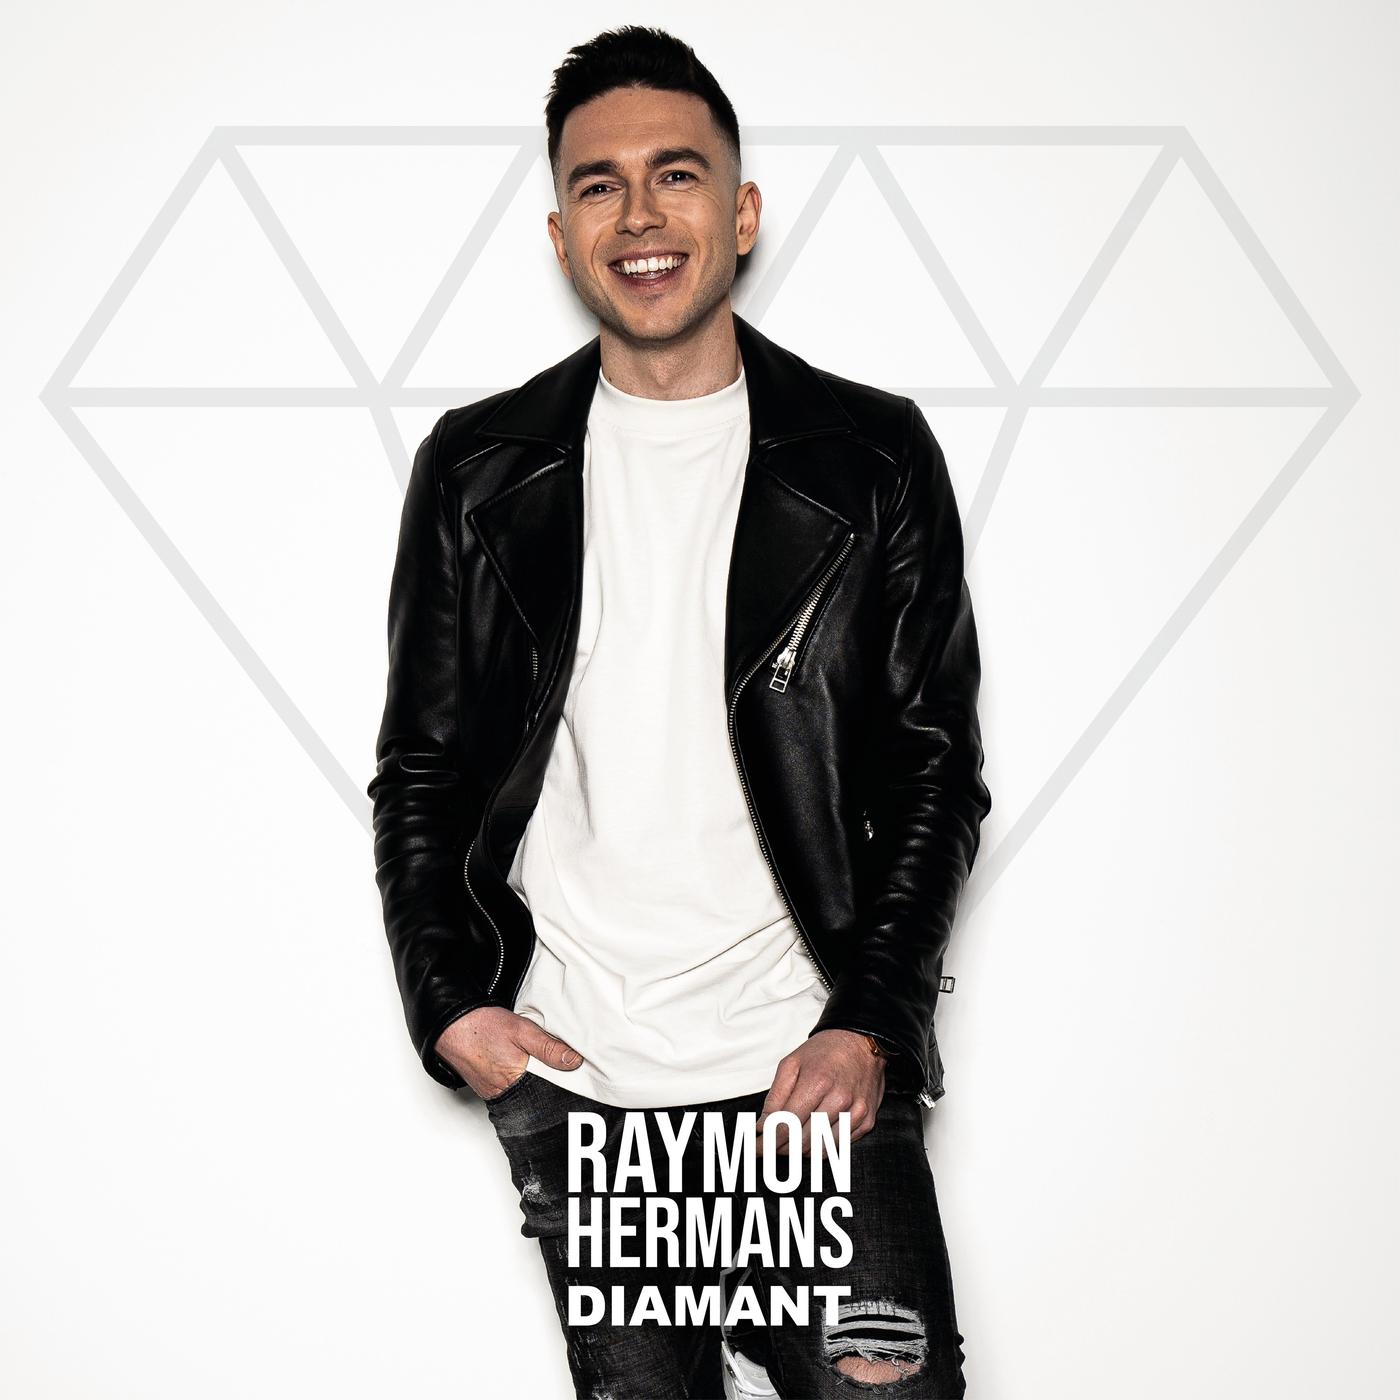 Nieuwe single Raymon Hermans: 'Diamant'